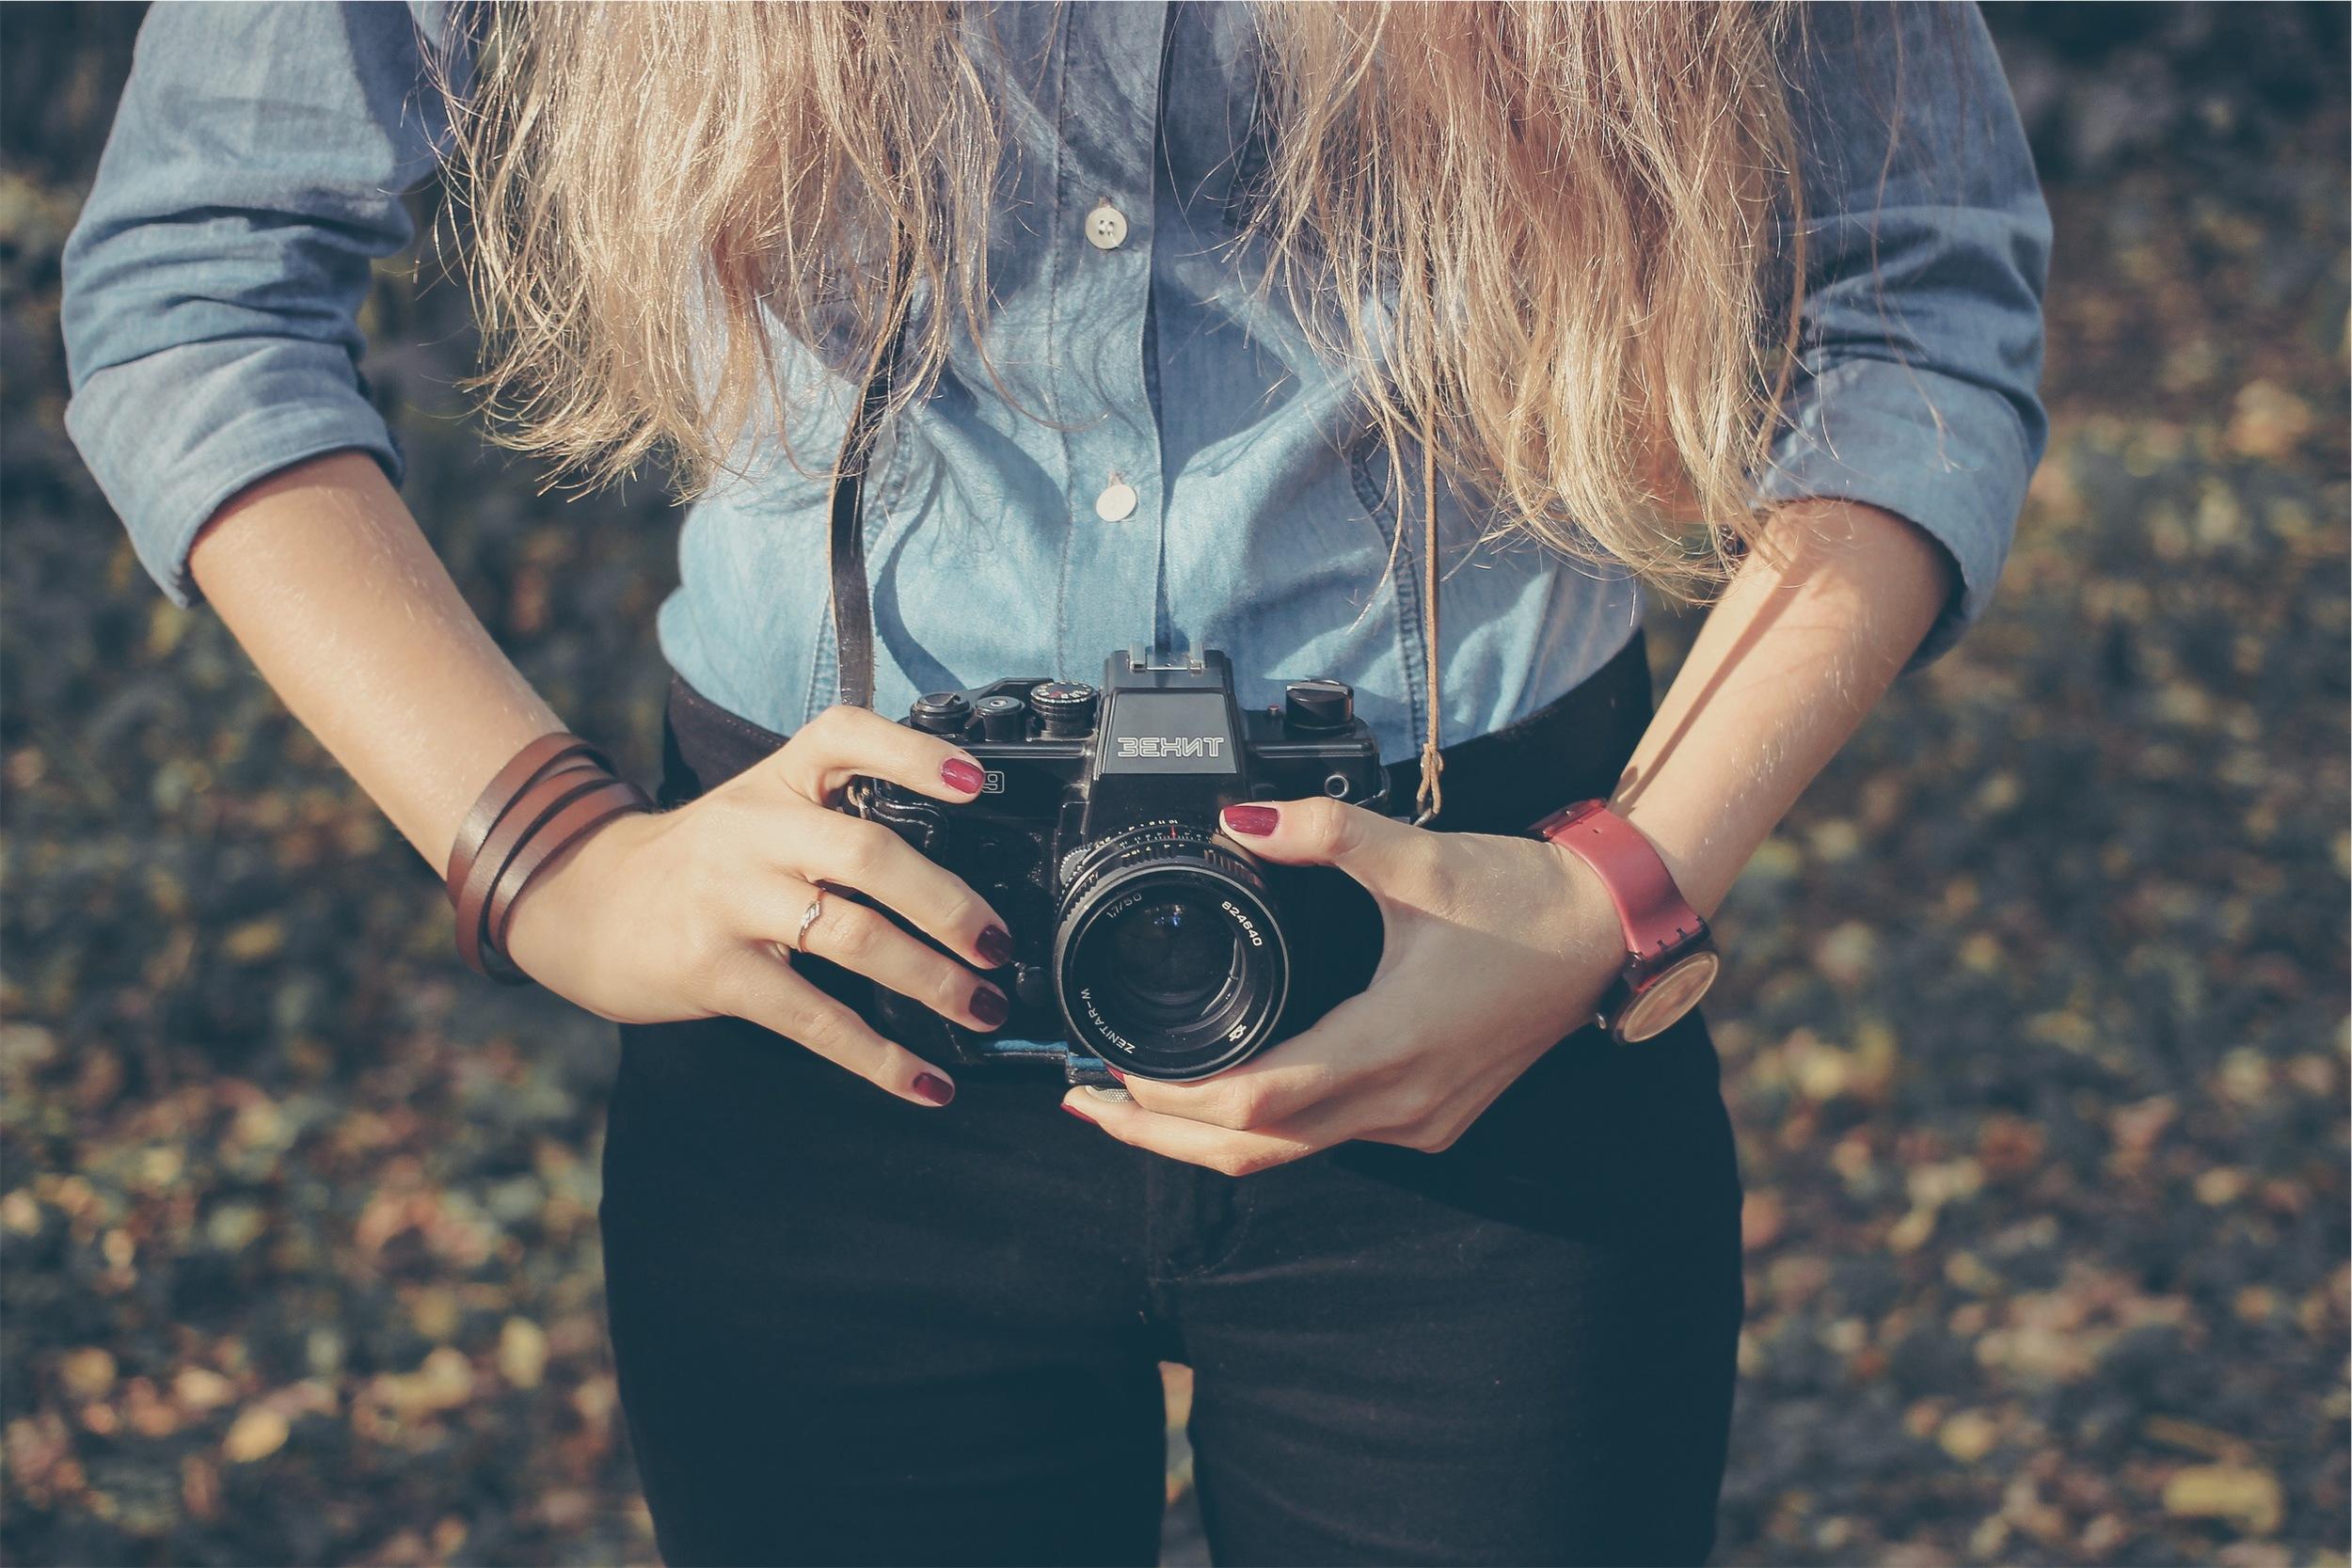 camera-person-photographer-4807.jpeg